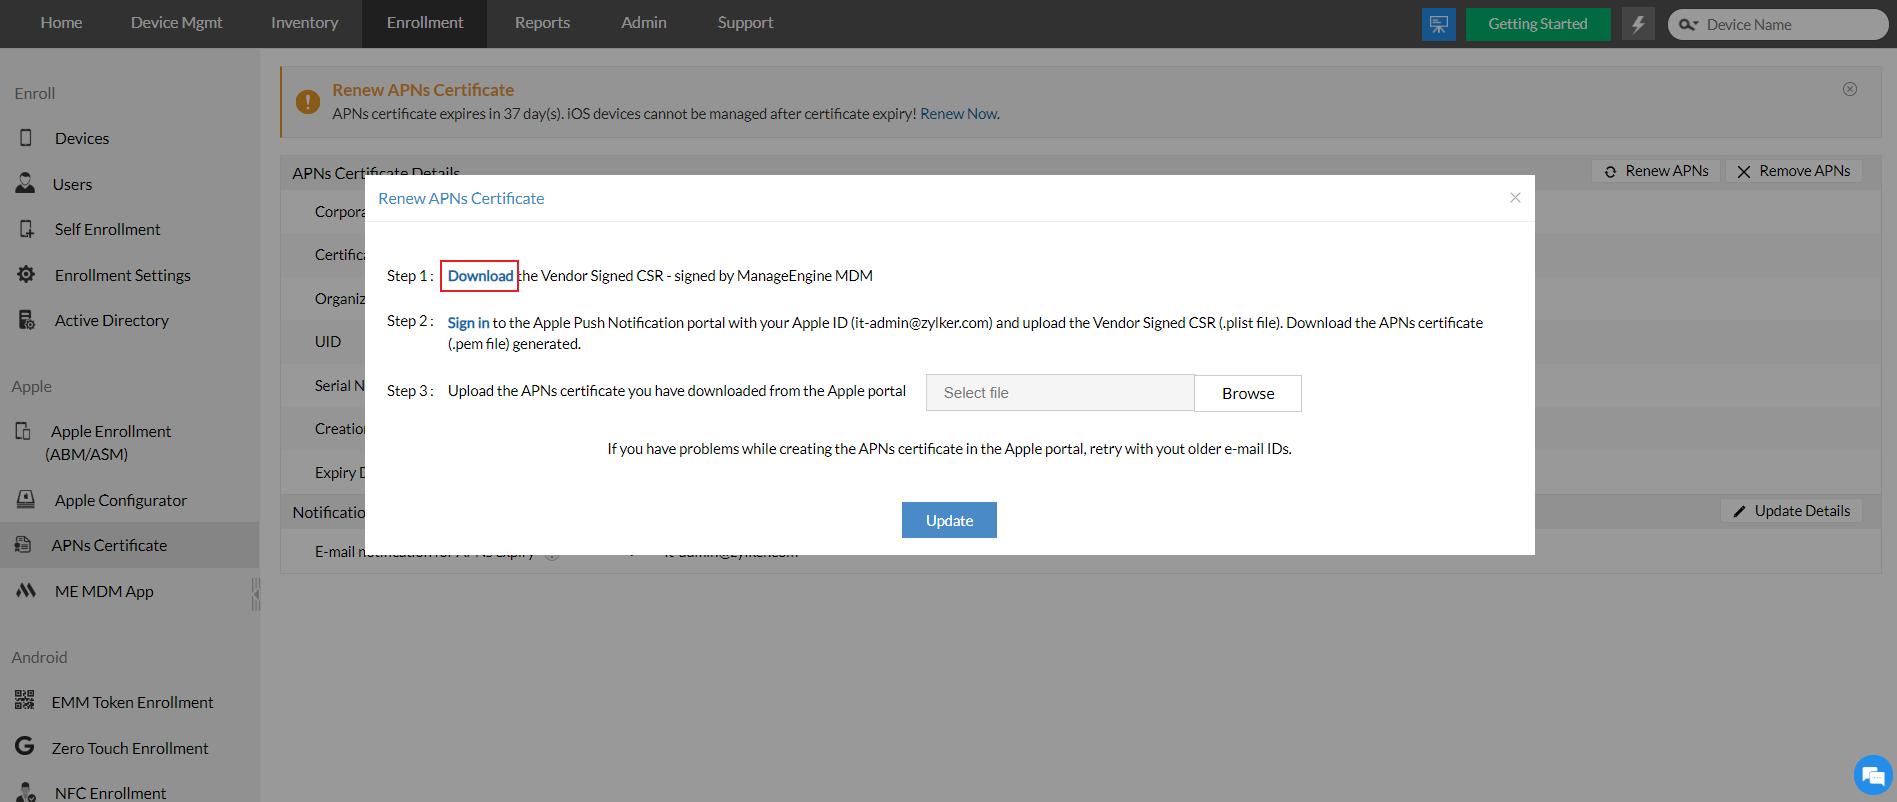 APNs certificate renewal by downloading the Vendor Signed CSR